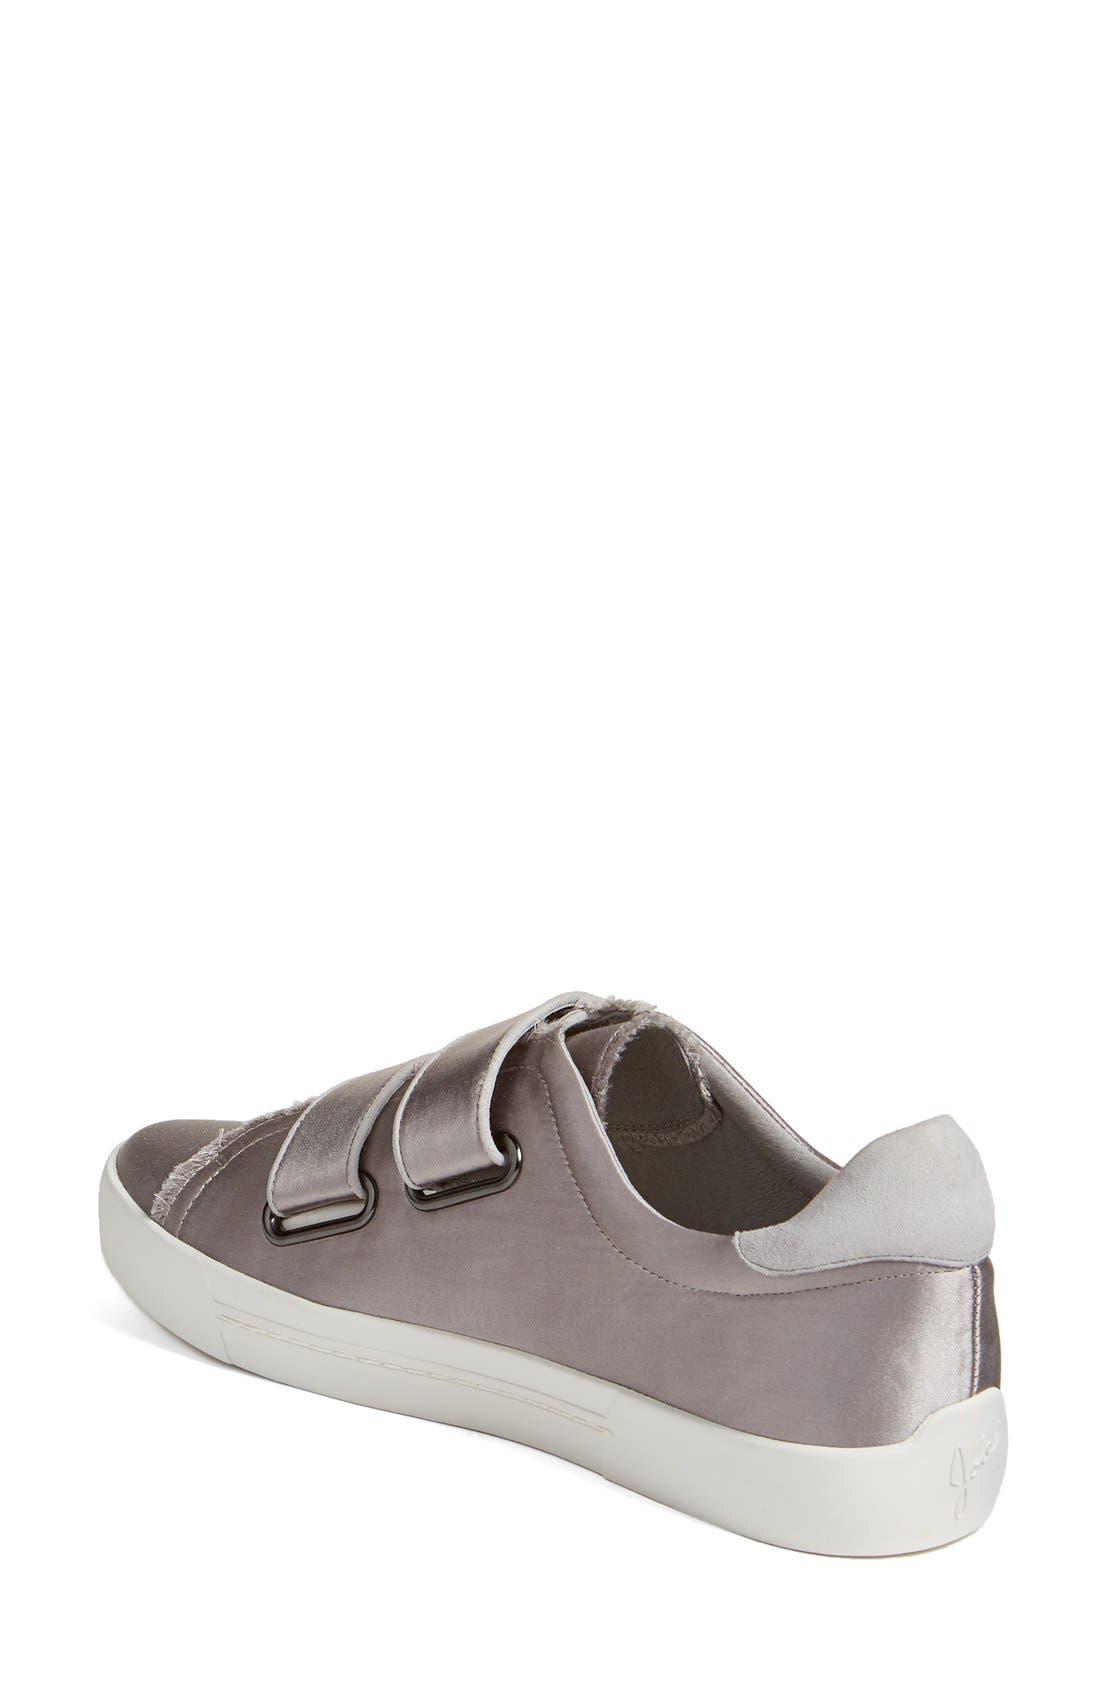 Alternate Image 2  - Joie 'Diata' Low Top Sneaker (Women)